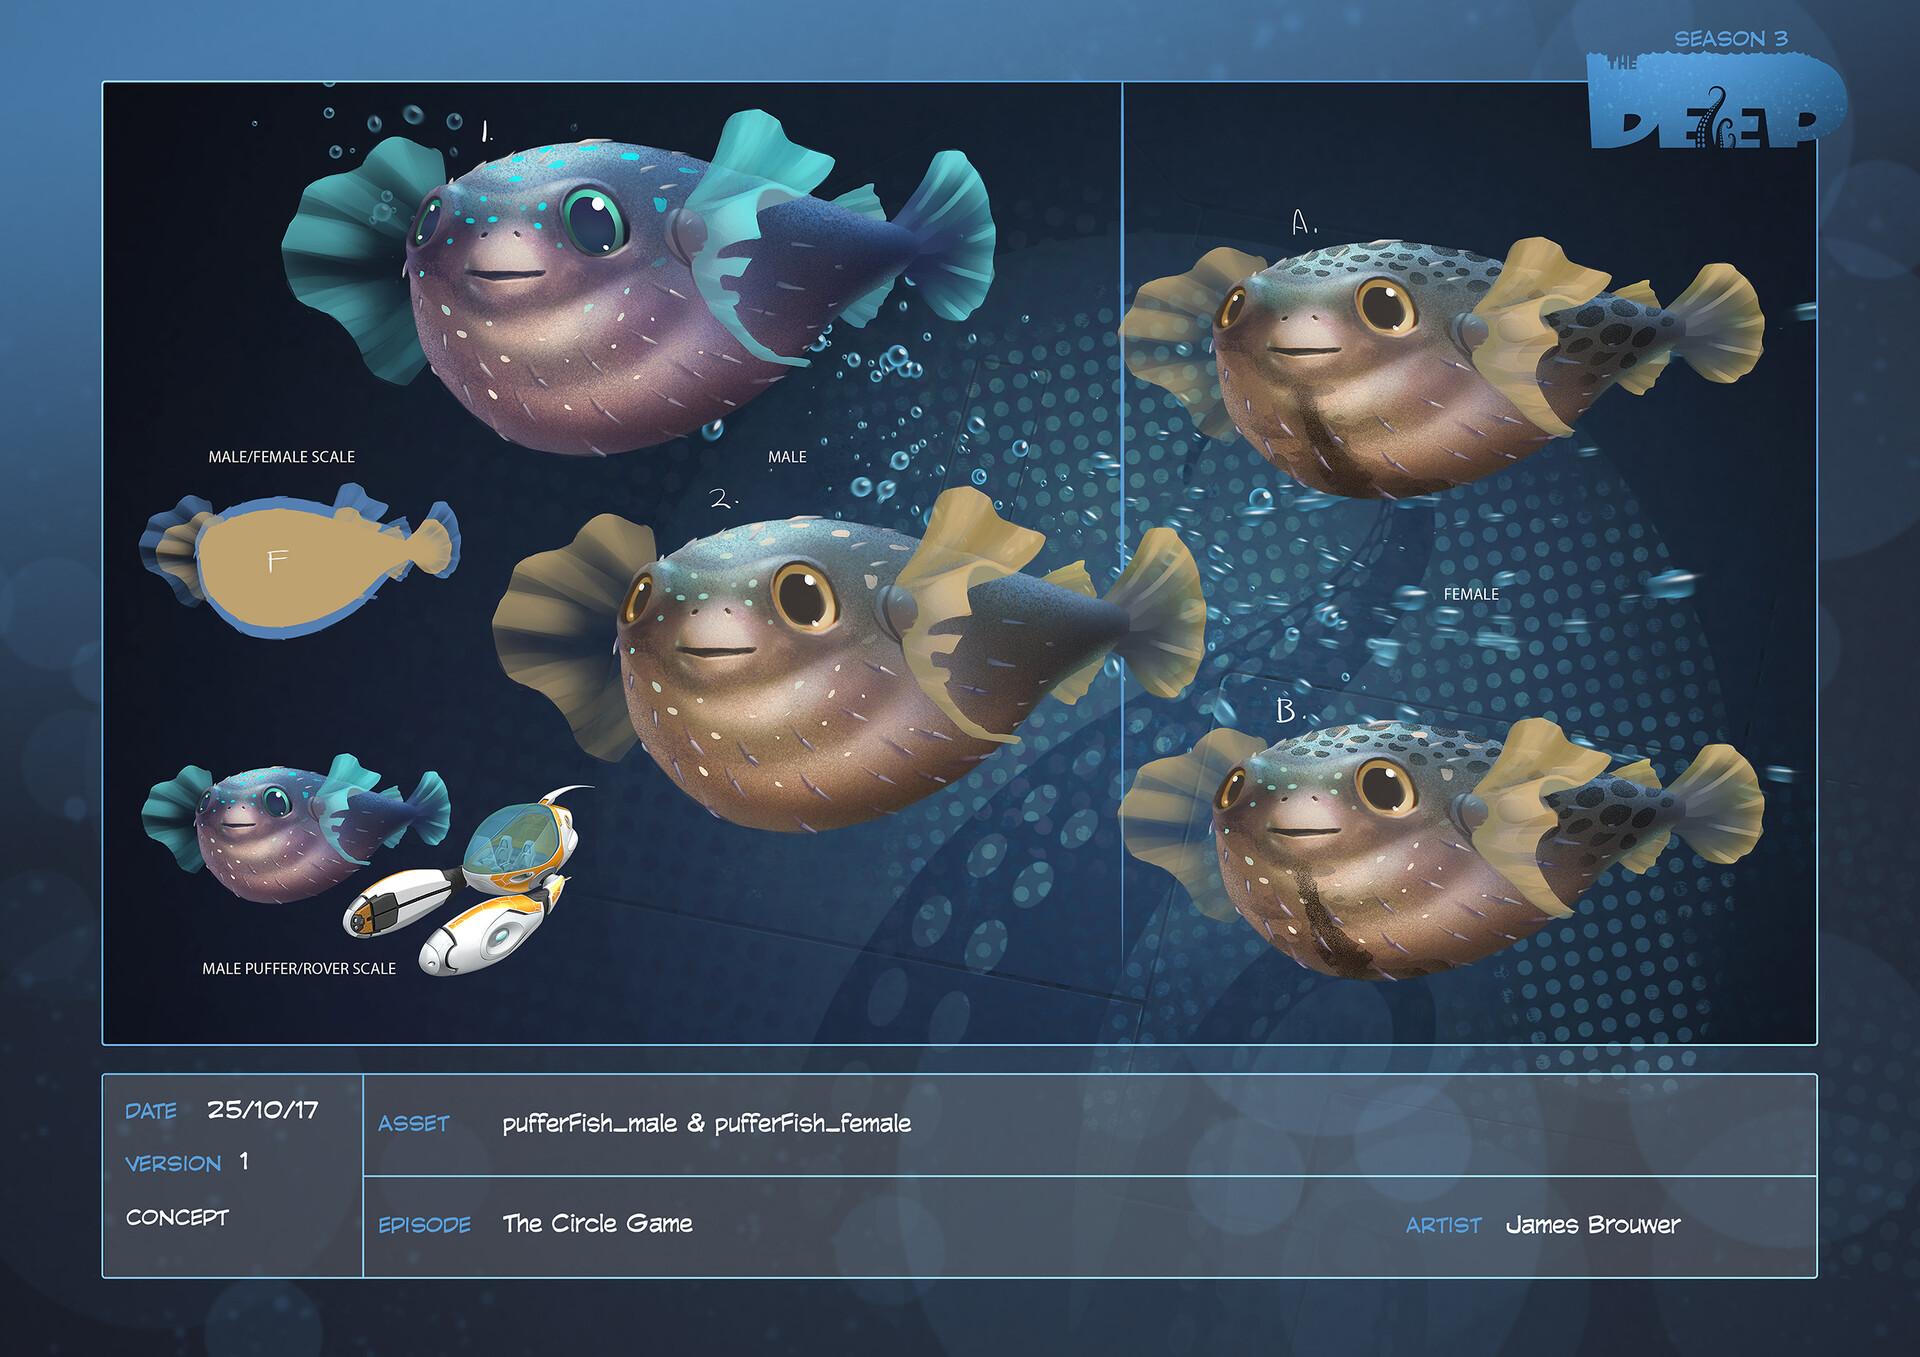 James brouwer pufferfish male pufferfish female design v001